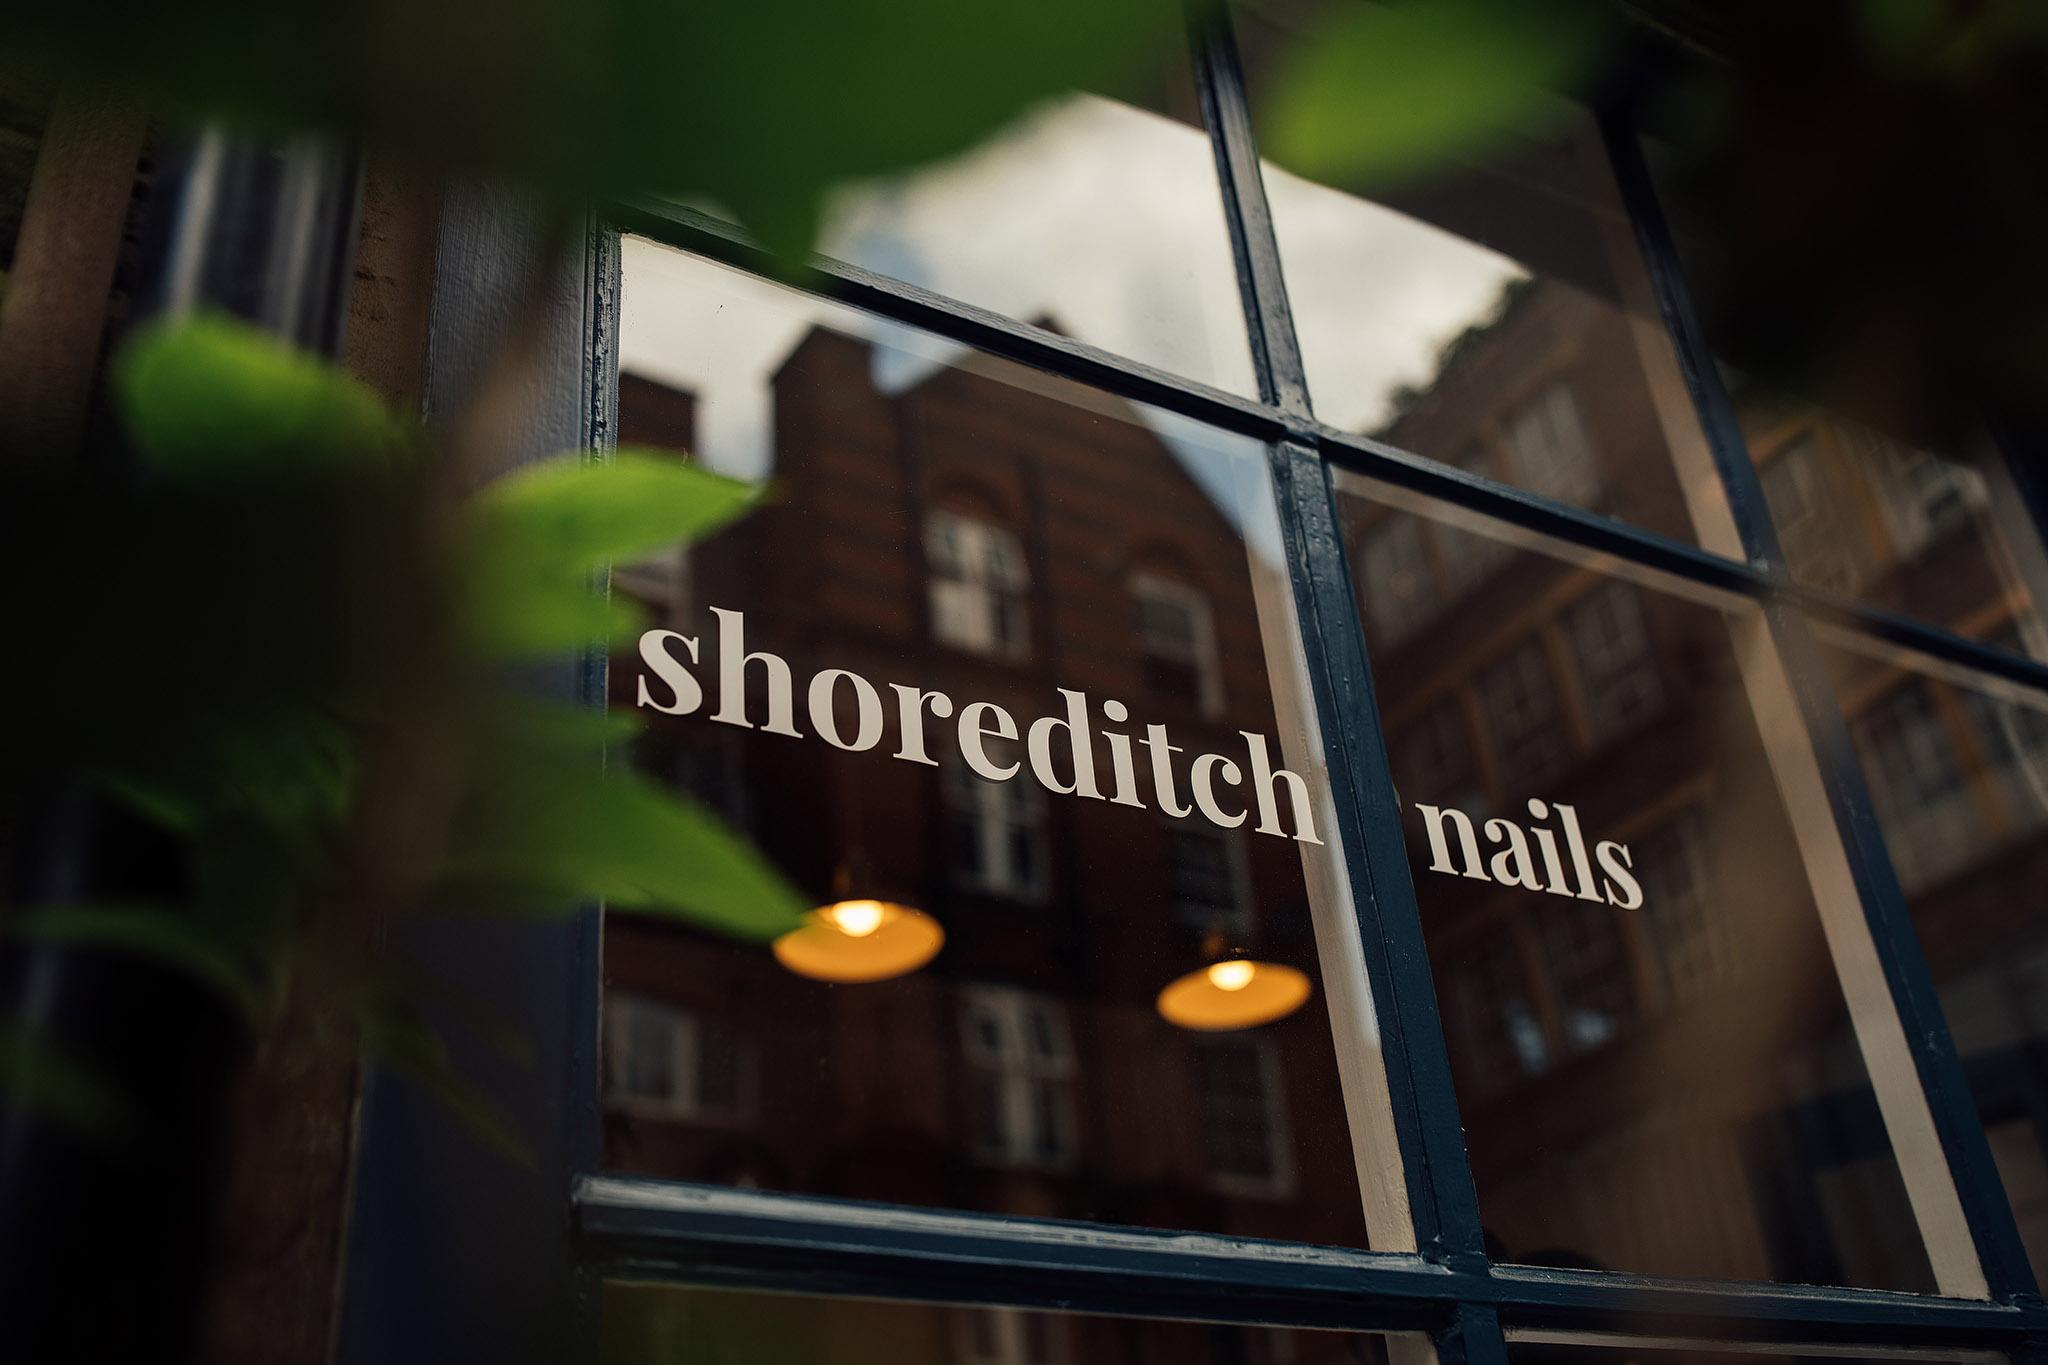 Shoreditch Nails - Photography-27.jpg